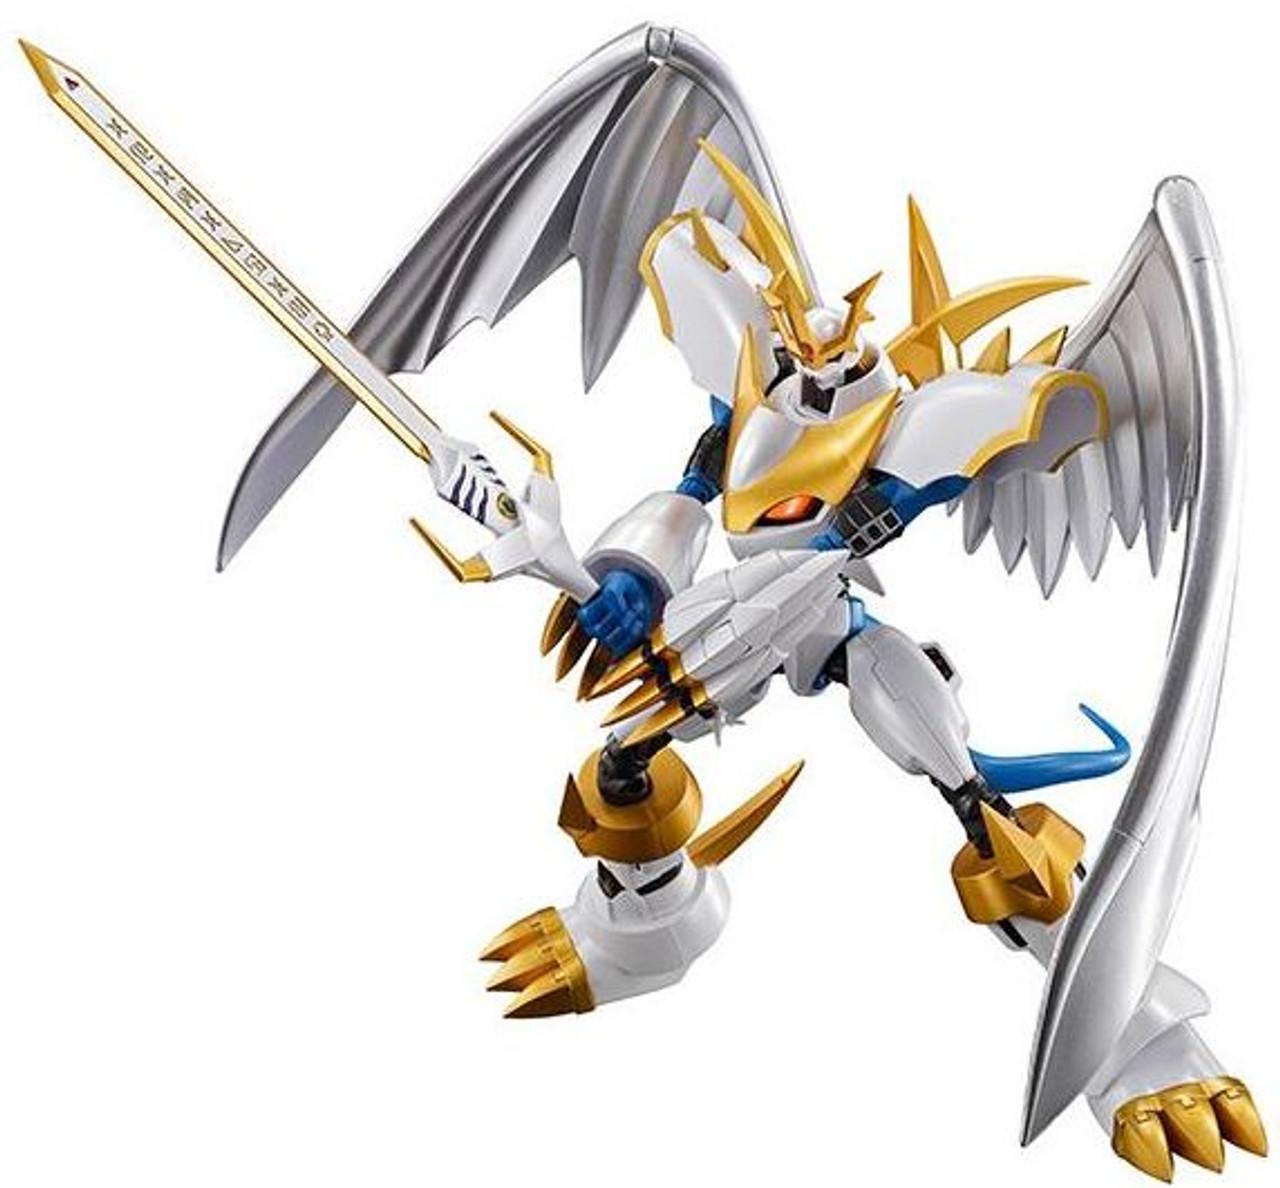 Digimon S.H. Figuarts Imperialdramon 6 Action Figure ...